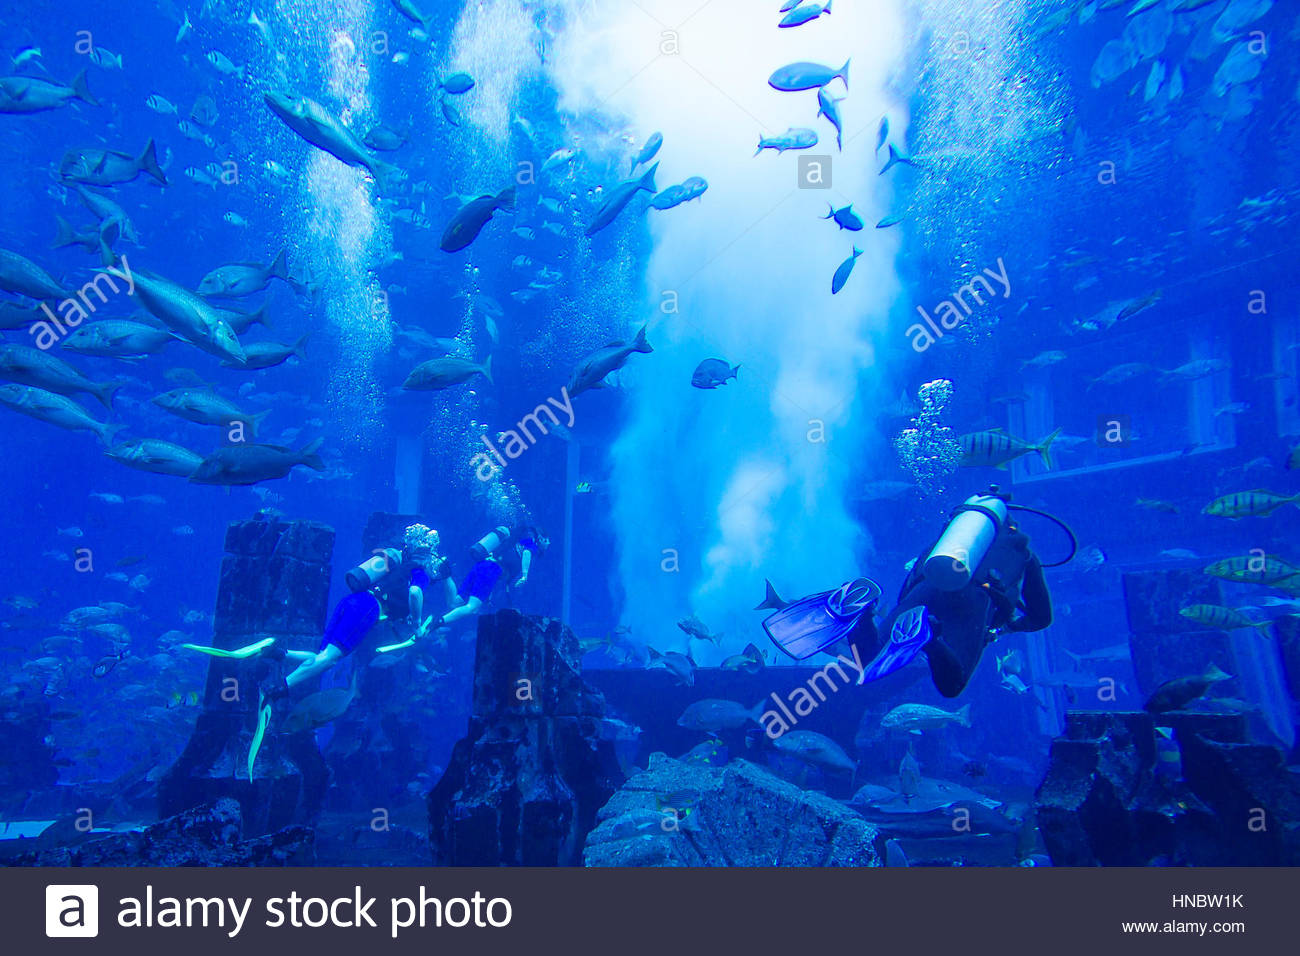 Taucher im Tank bei Lost Chambers, Unterwasser Meeresaquarium voller Meeresleben im Atlantis Palm Resort. Stockbild